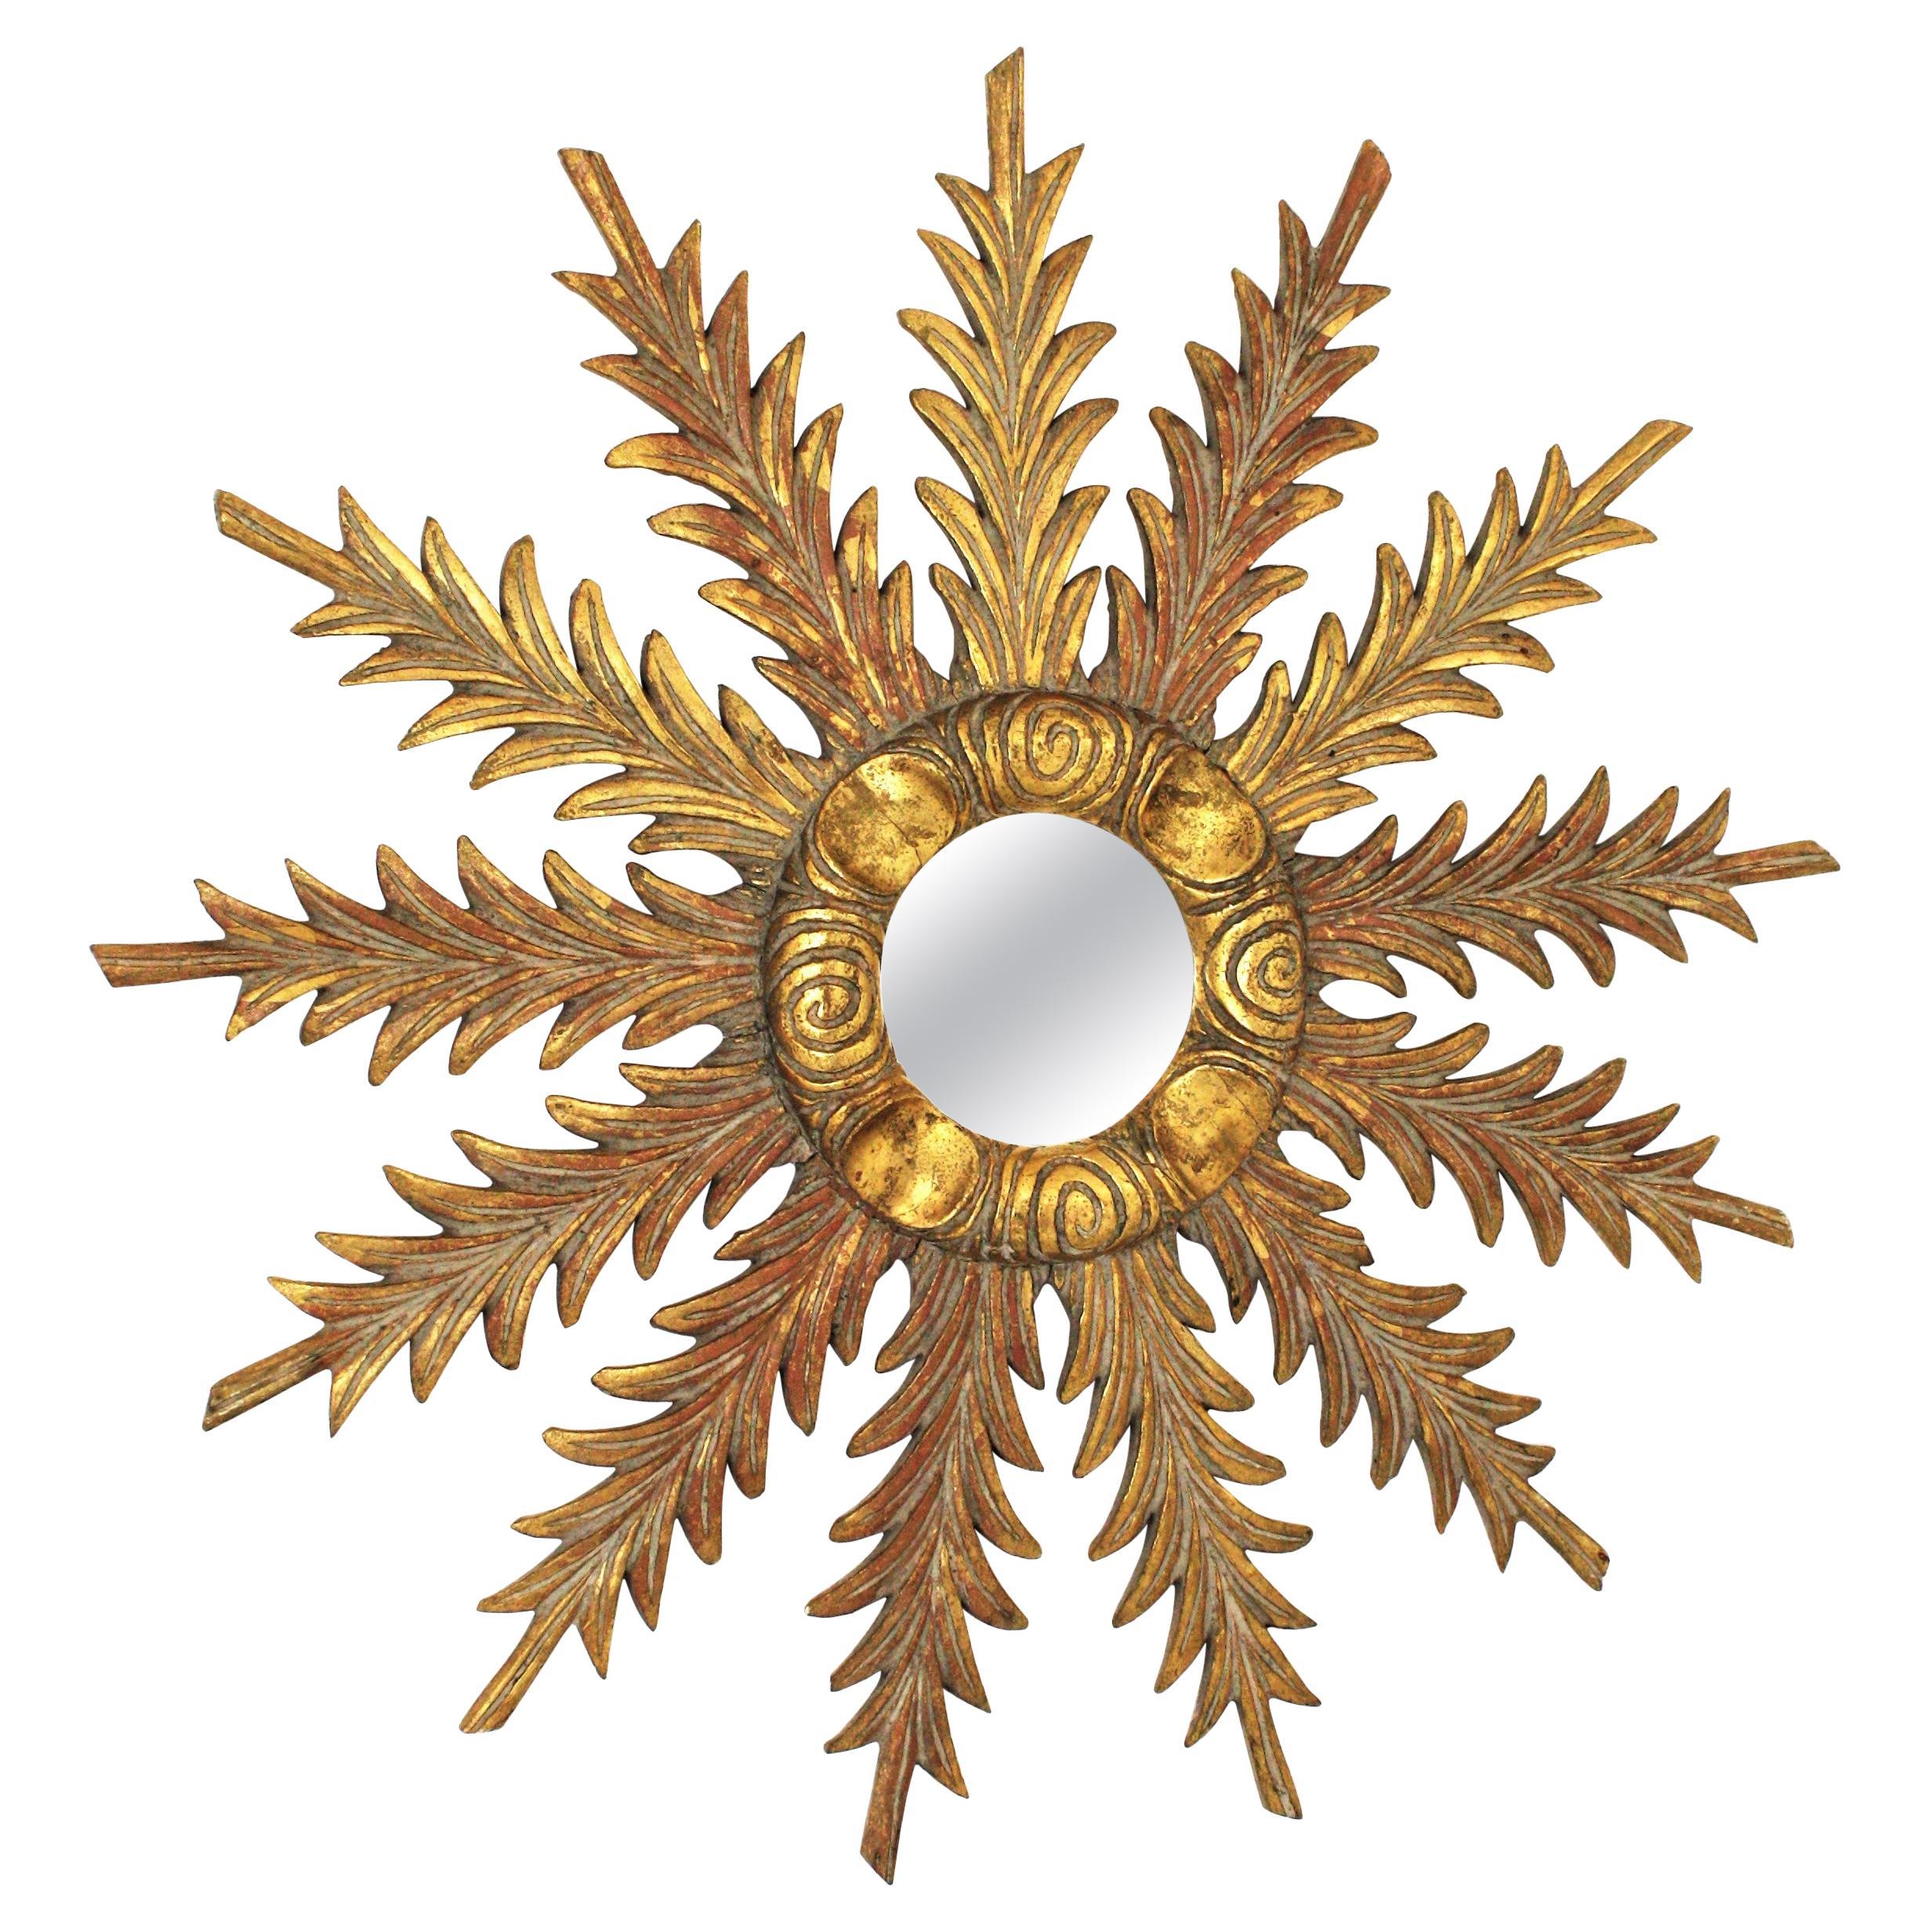 Spanish Sunburst Starburst Mirror in Giltwood